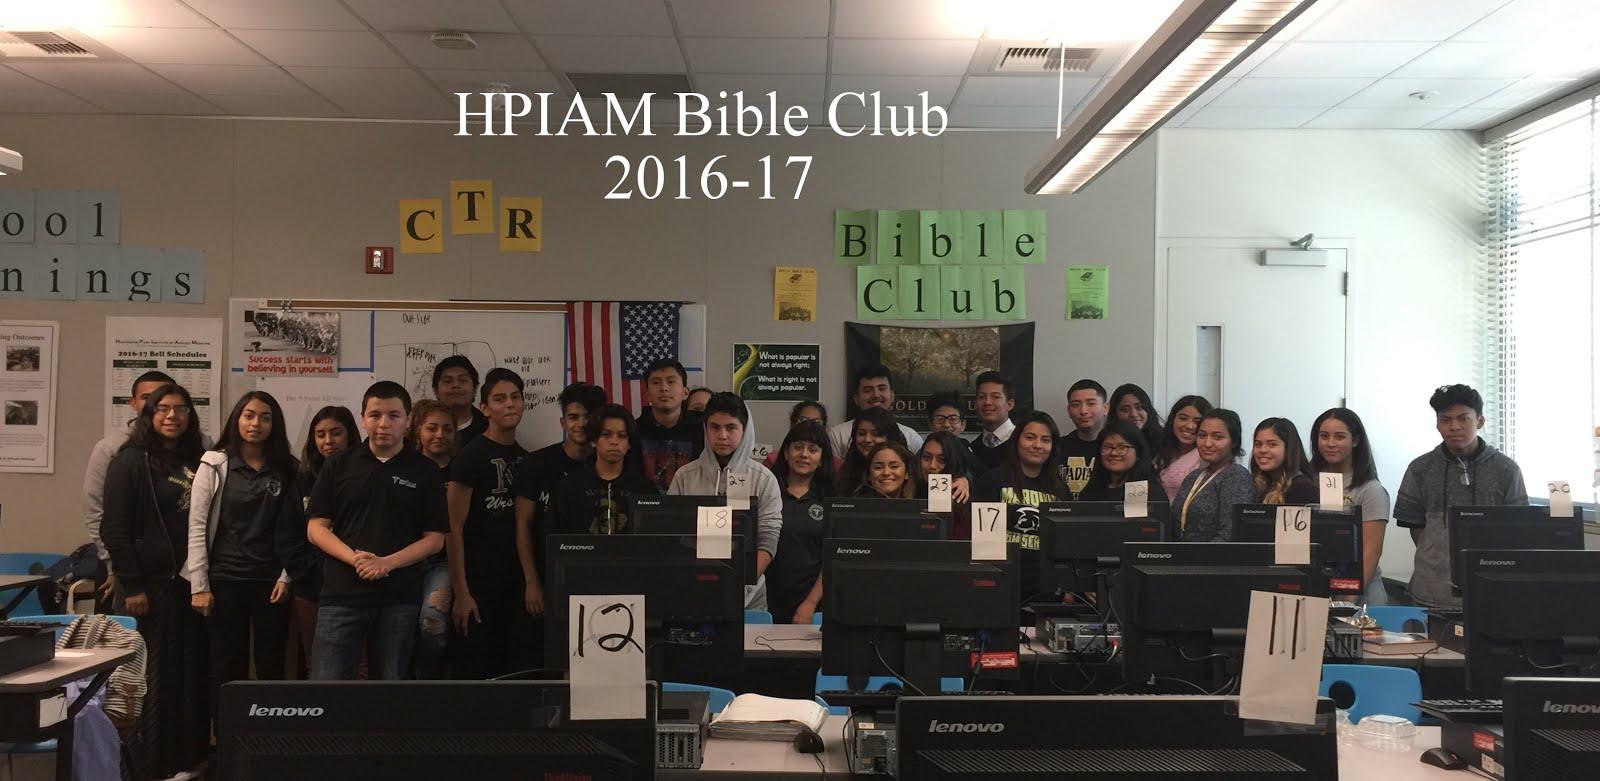 Bible Club Members 2016-17